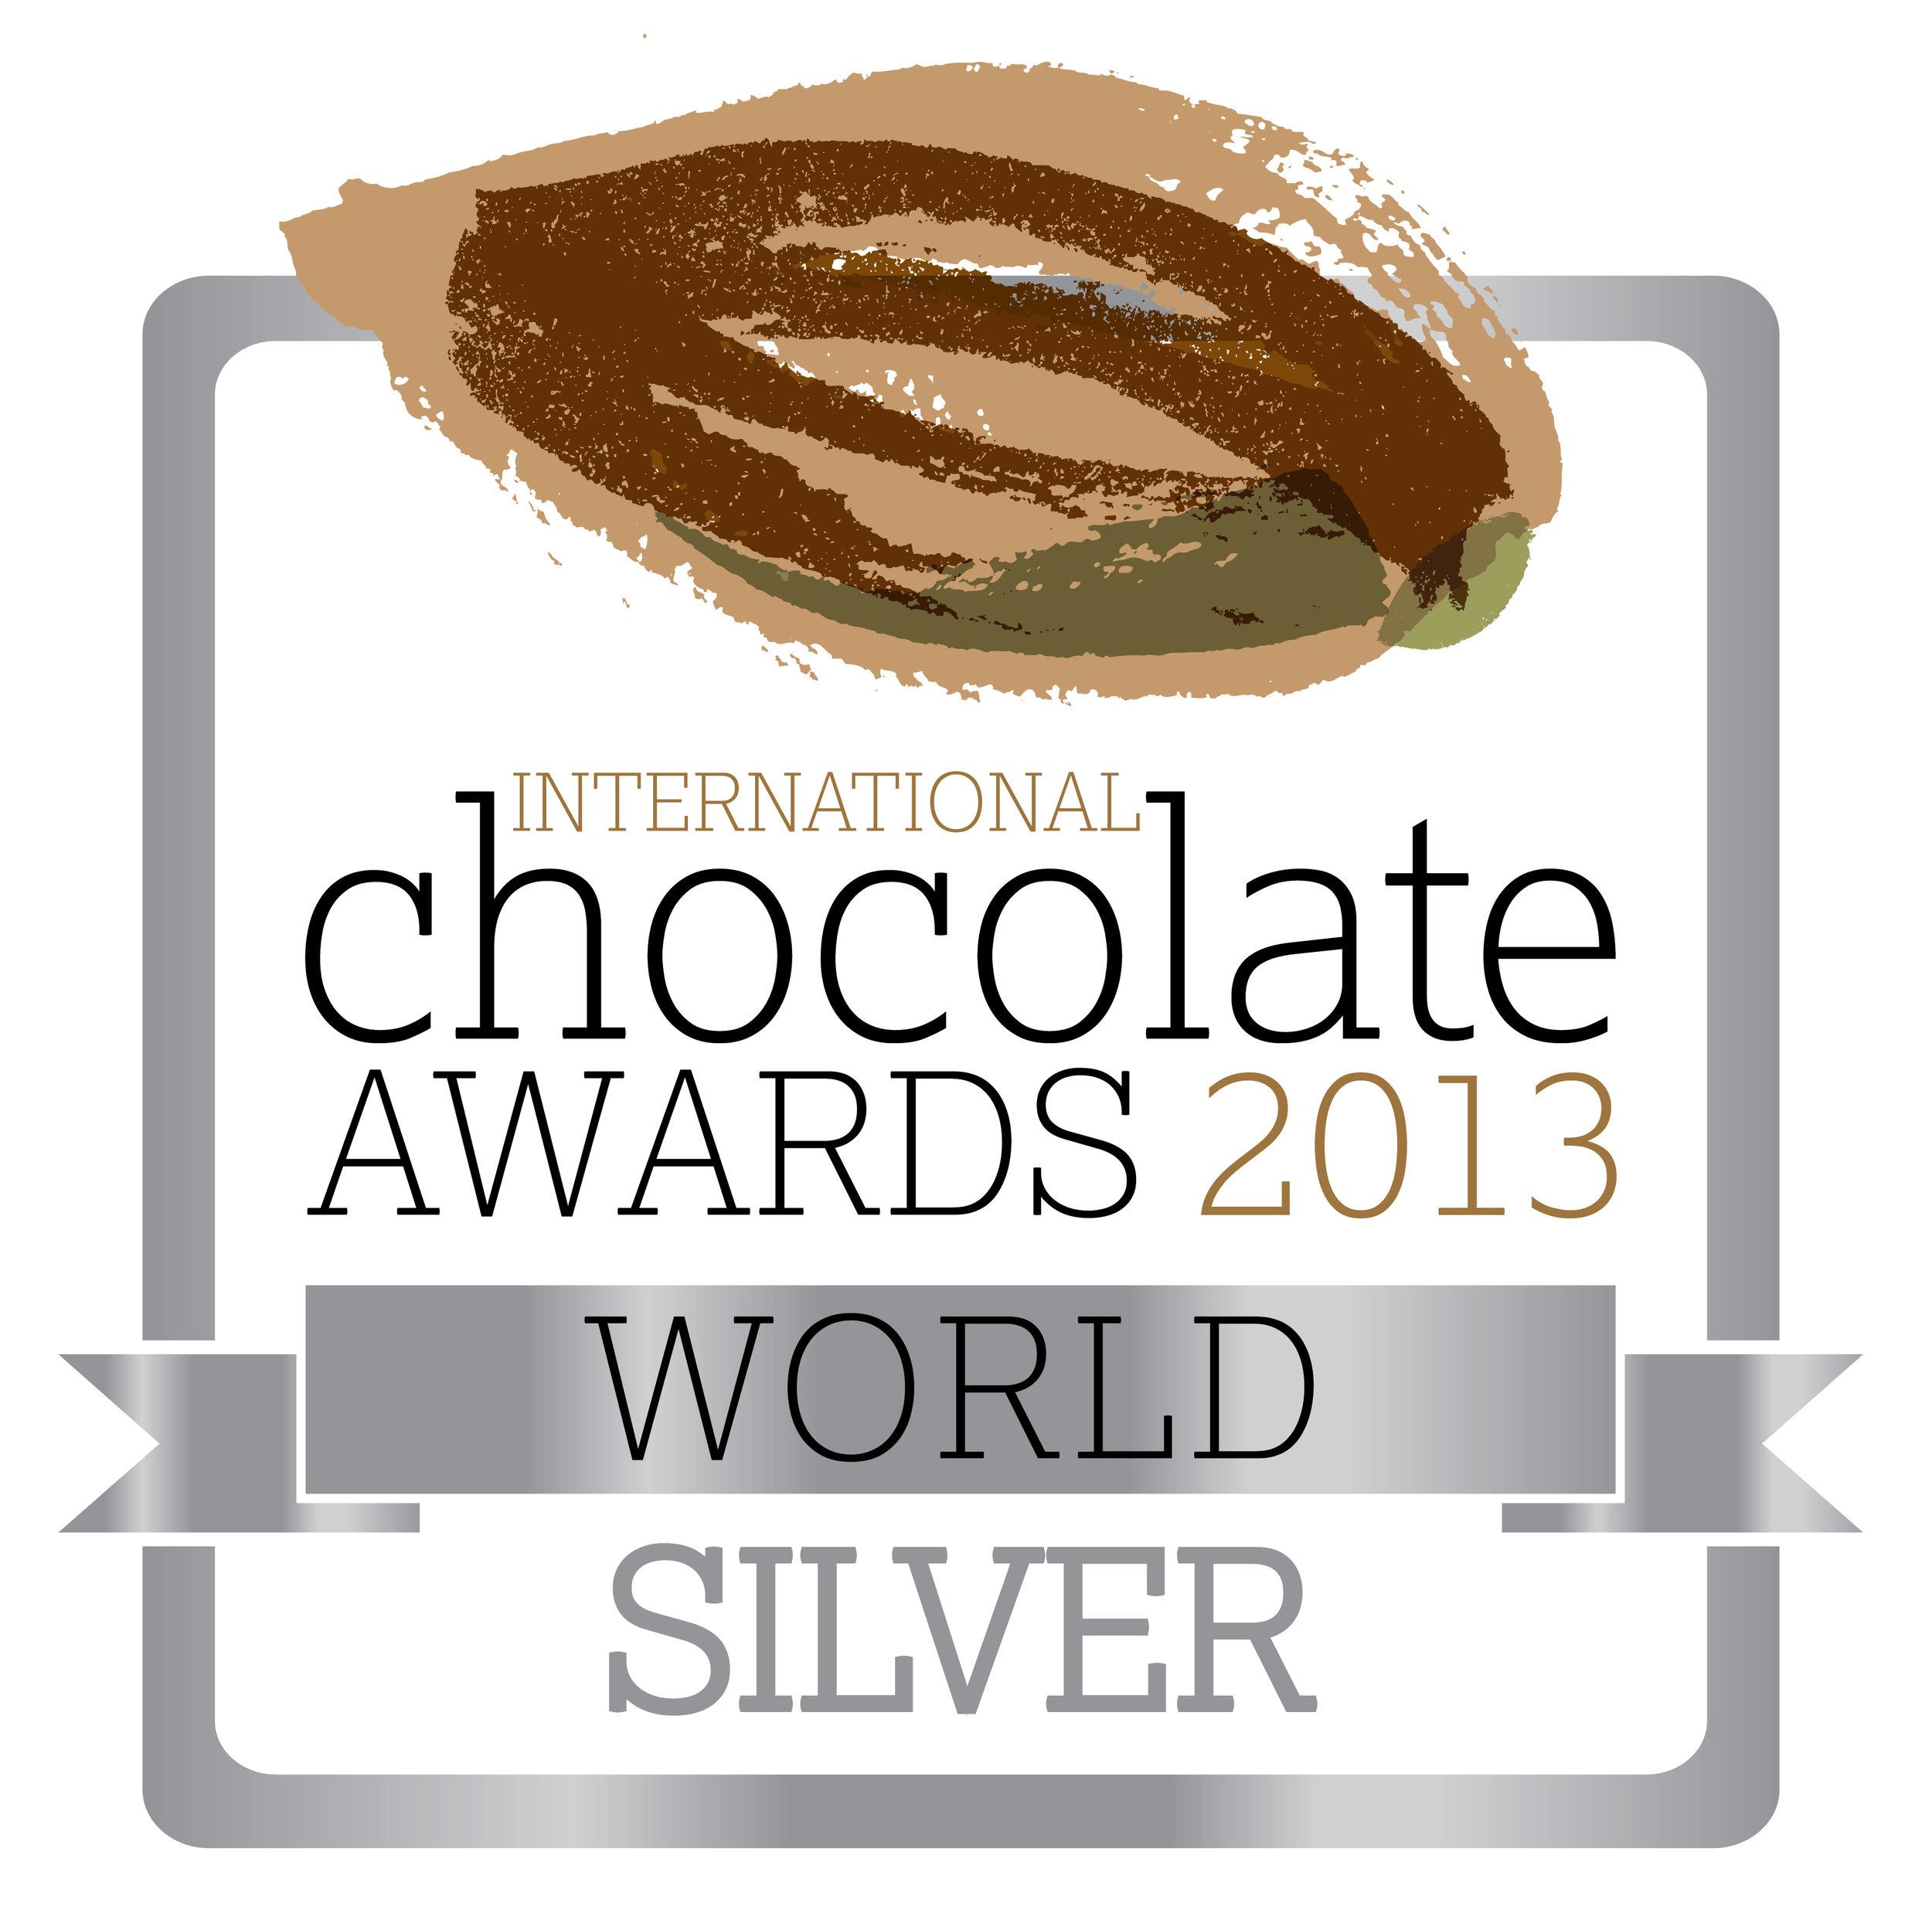 International Chocolate Award World Win 2013